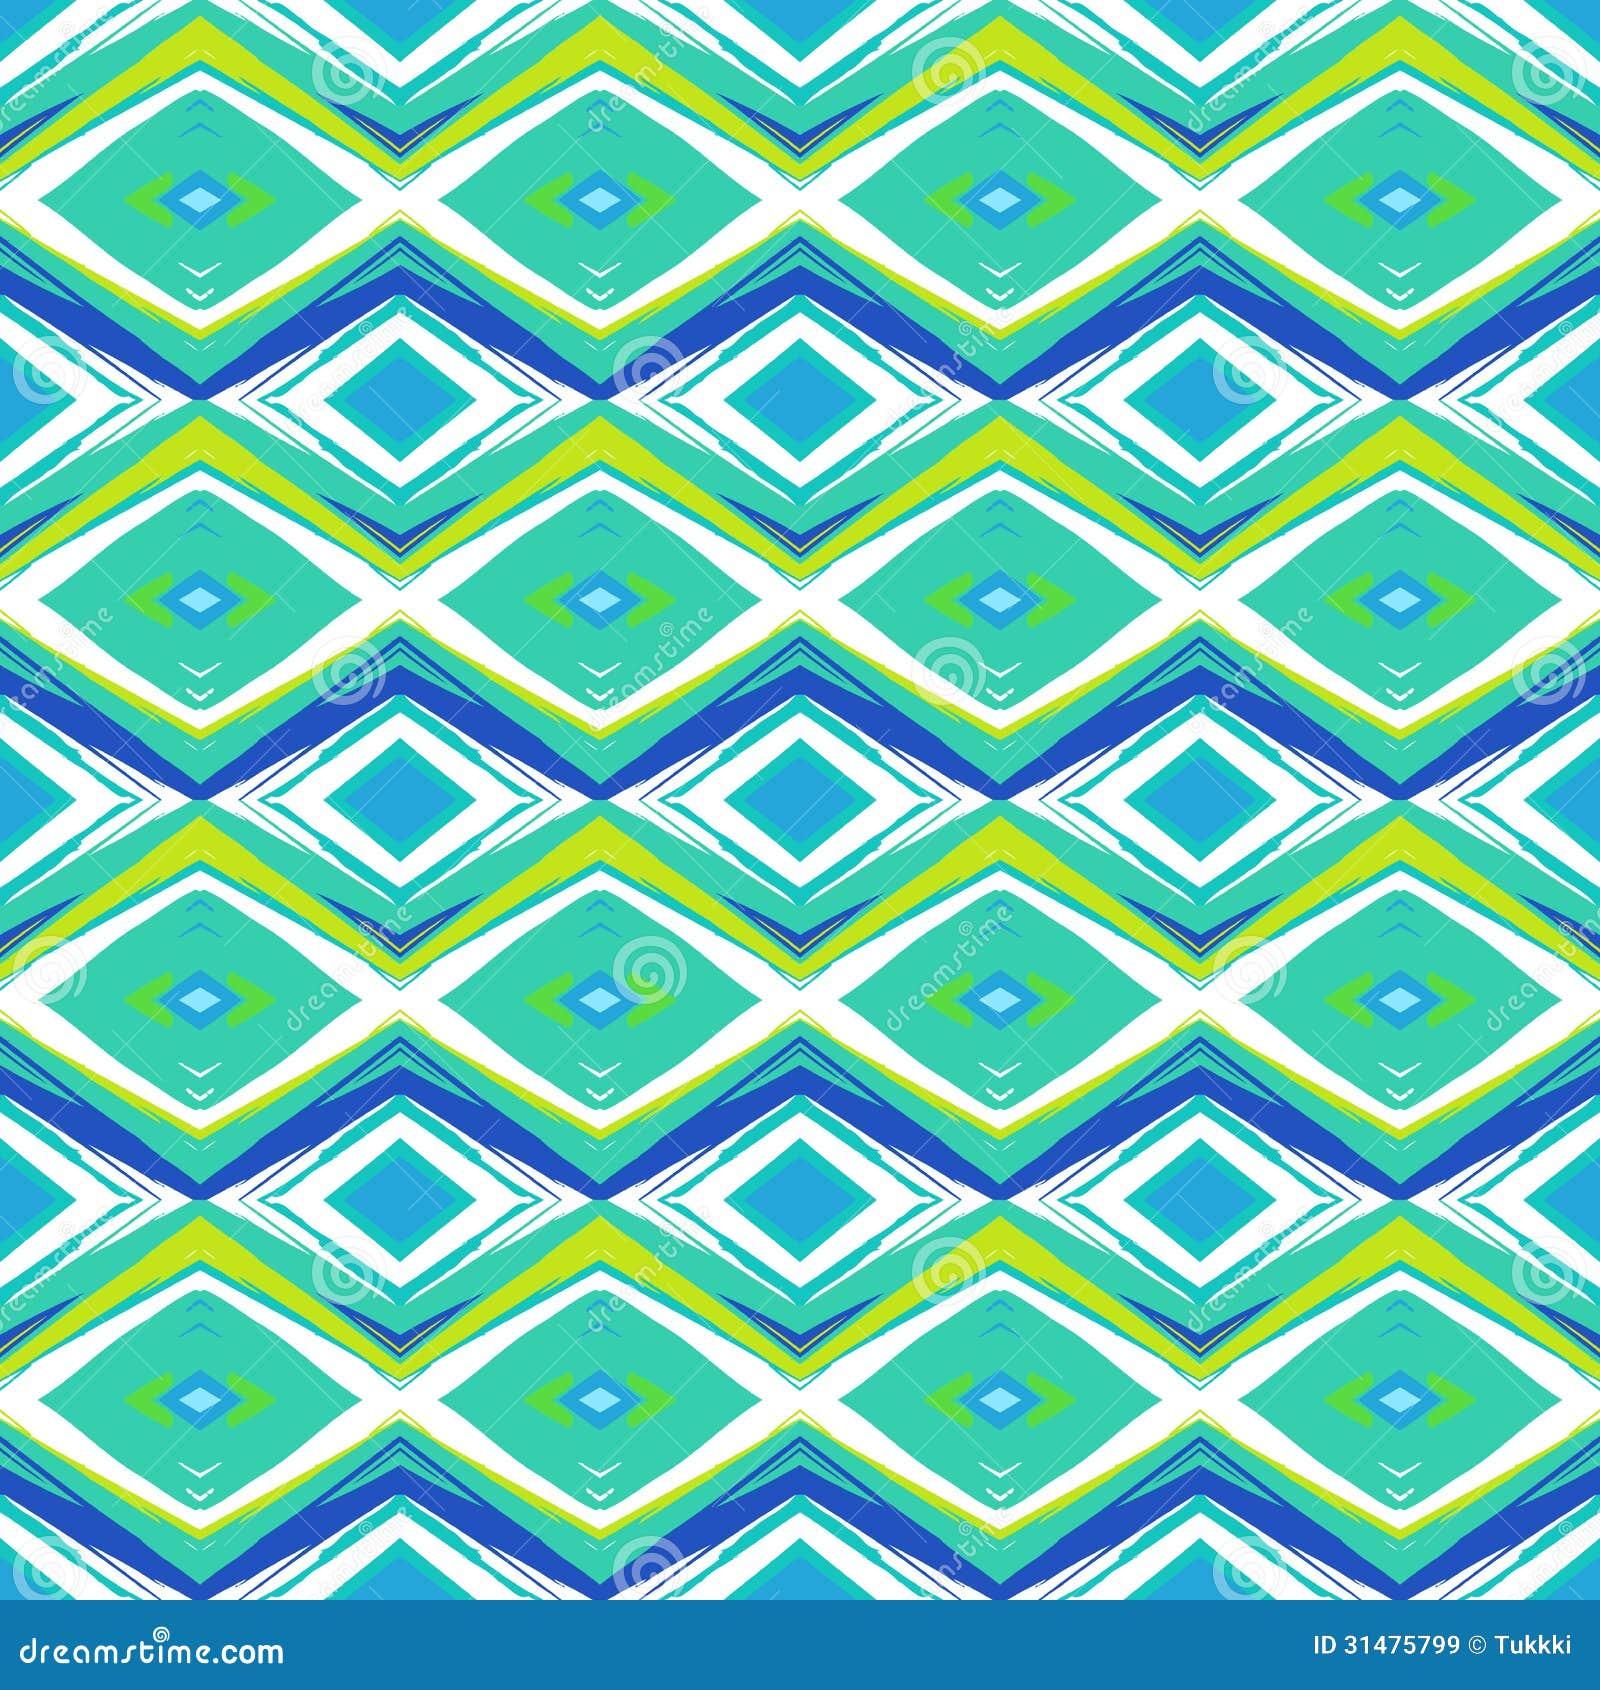 Wallpaper Pattern Modern Blue